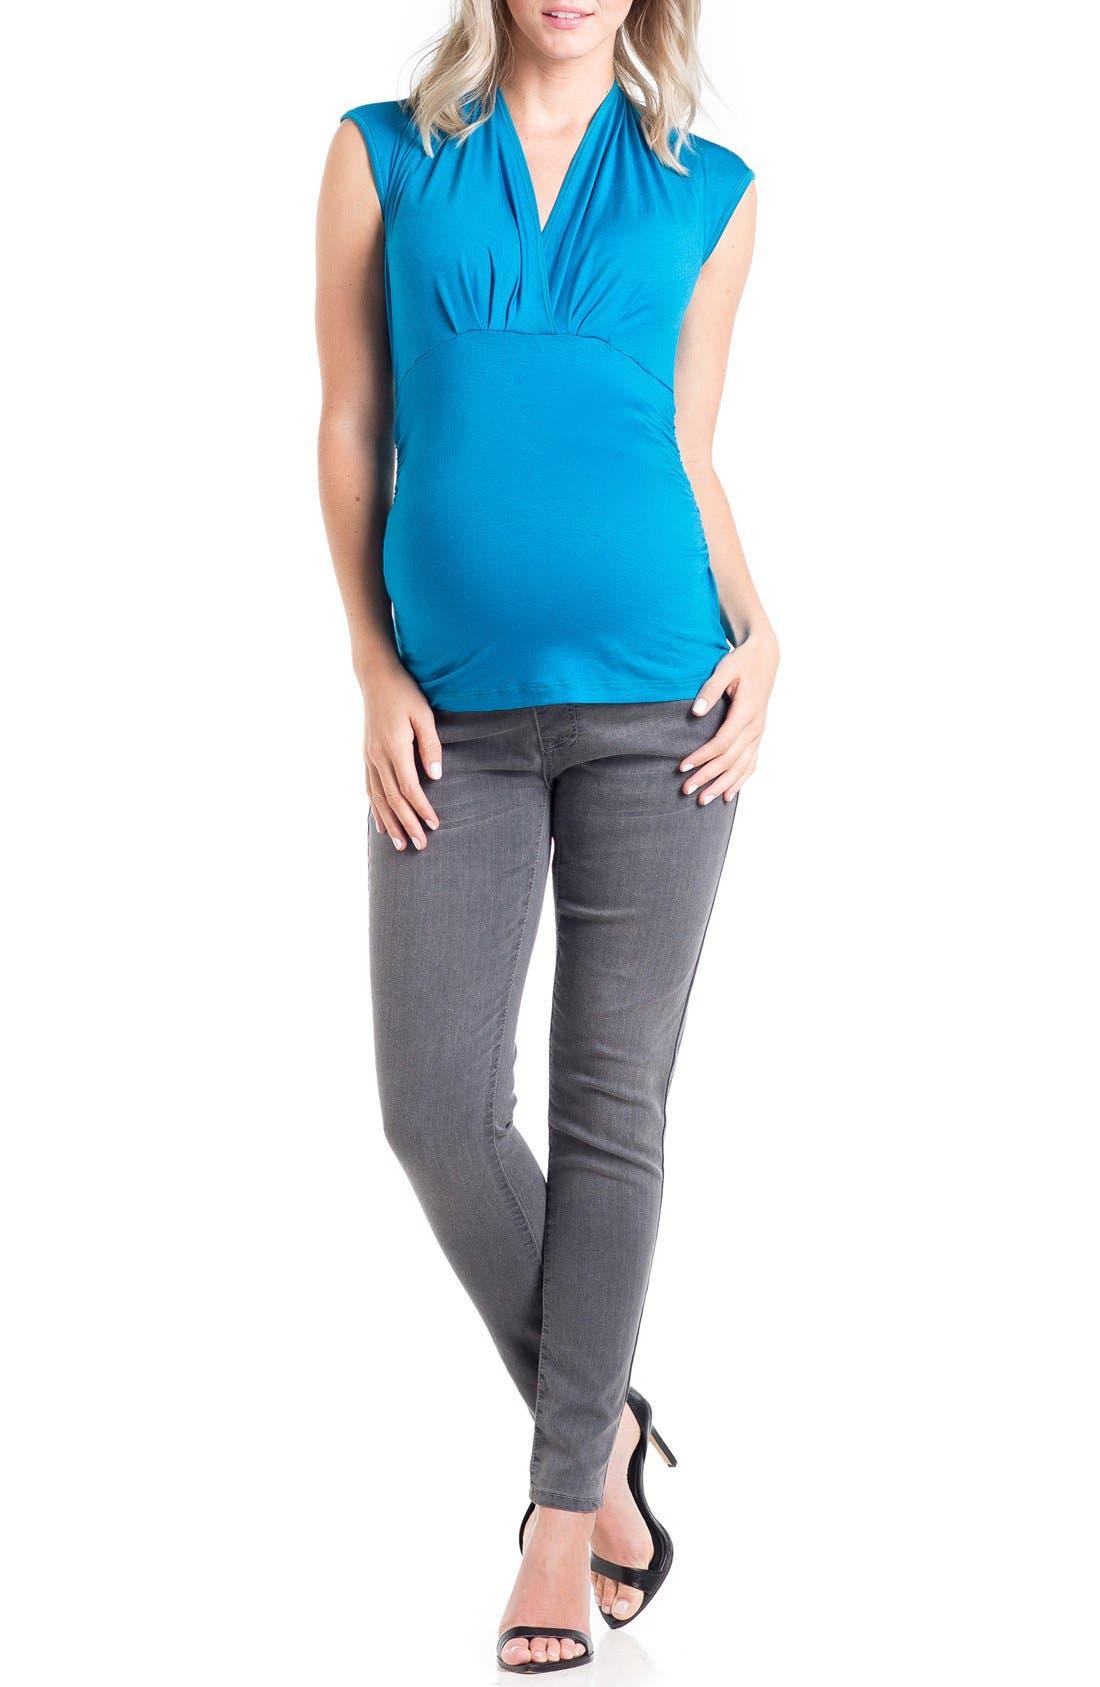 Alternate Image 1 Selected - Lilac Clothing 'Megan' V-Neck Maternity Top